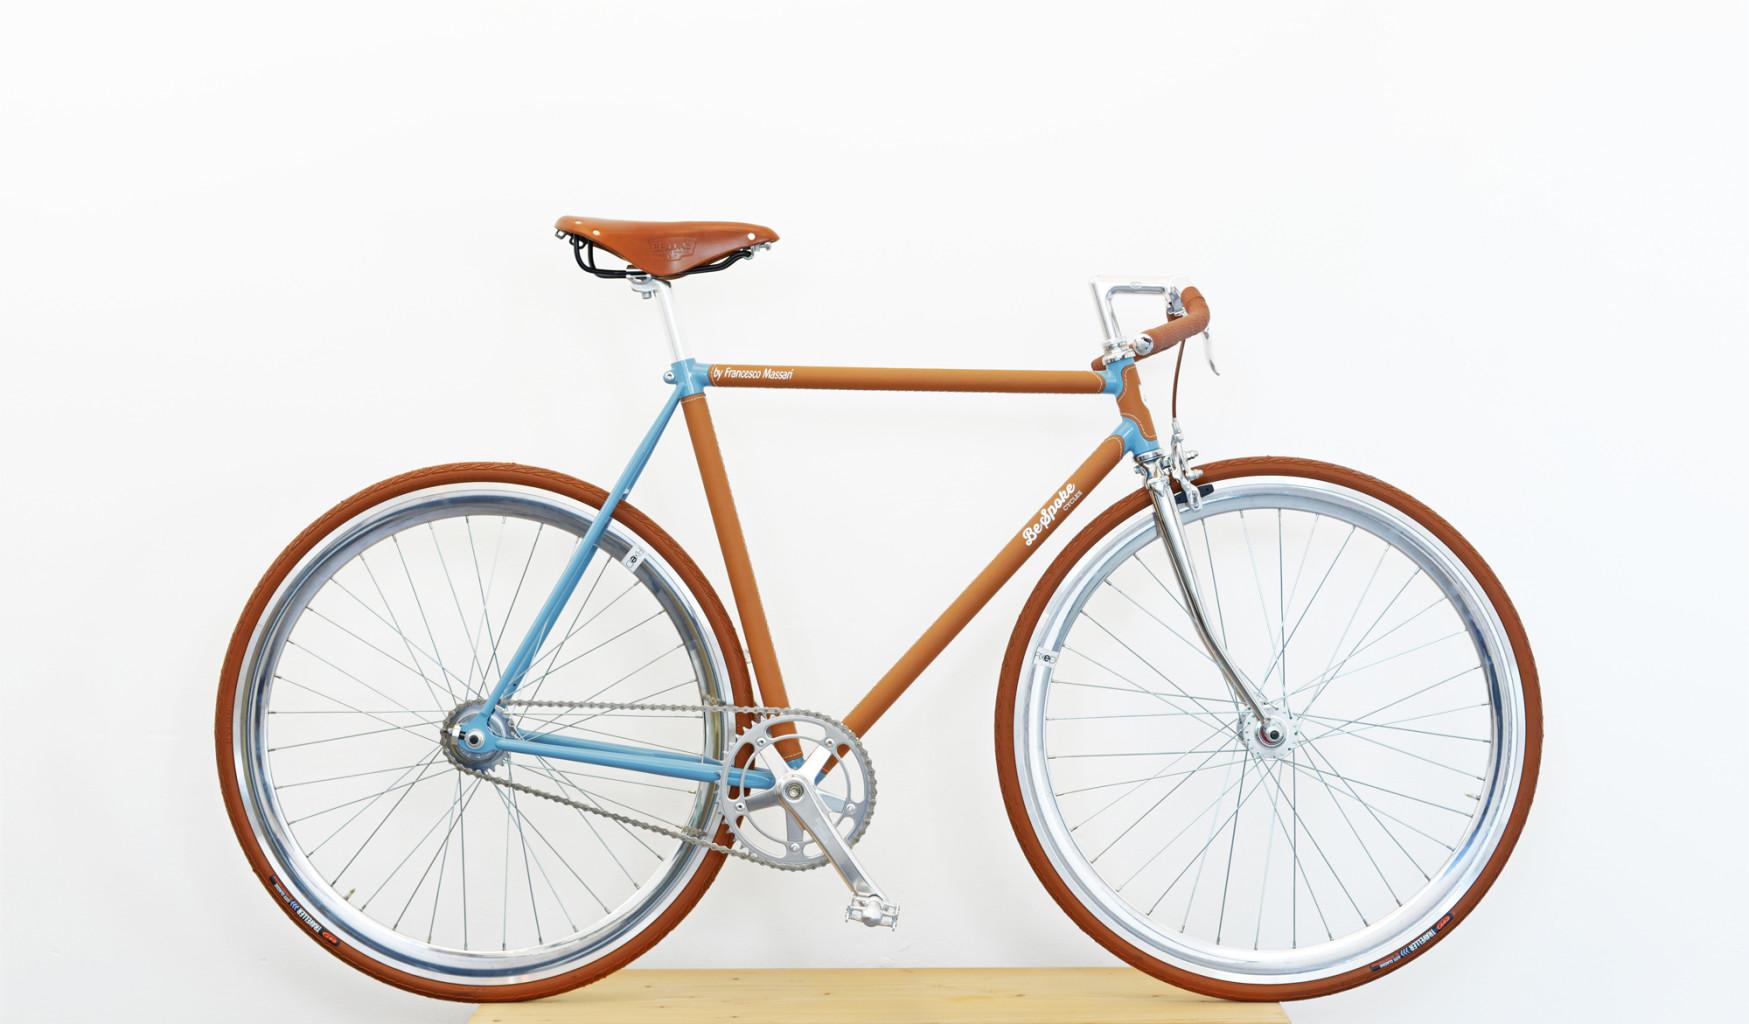 Bespoke bike 1